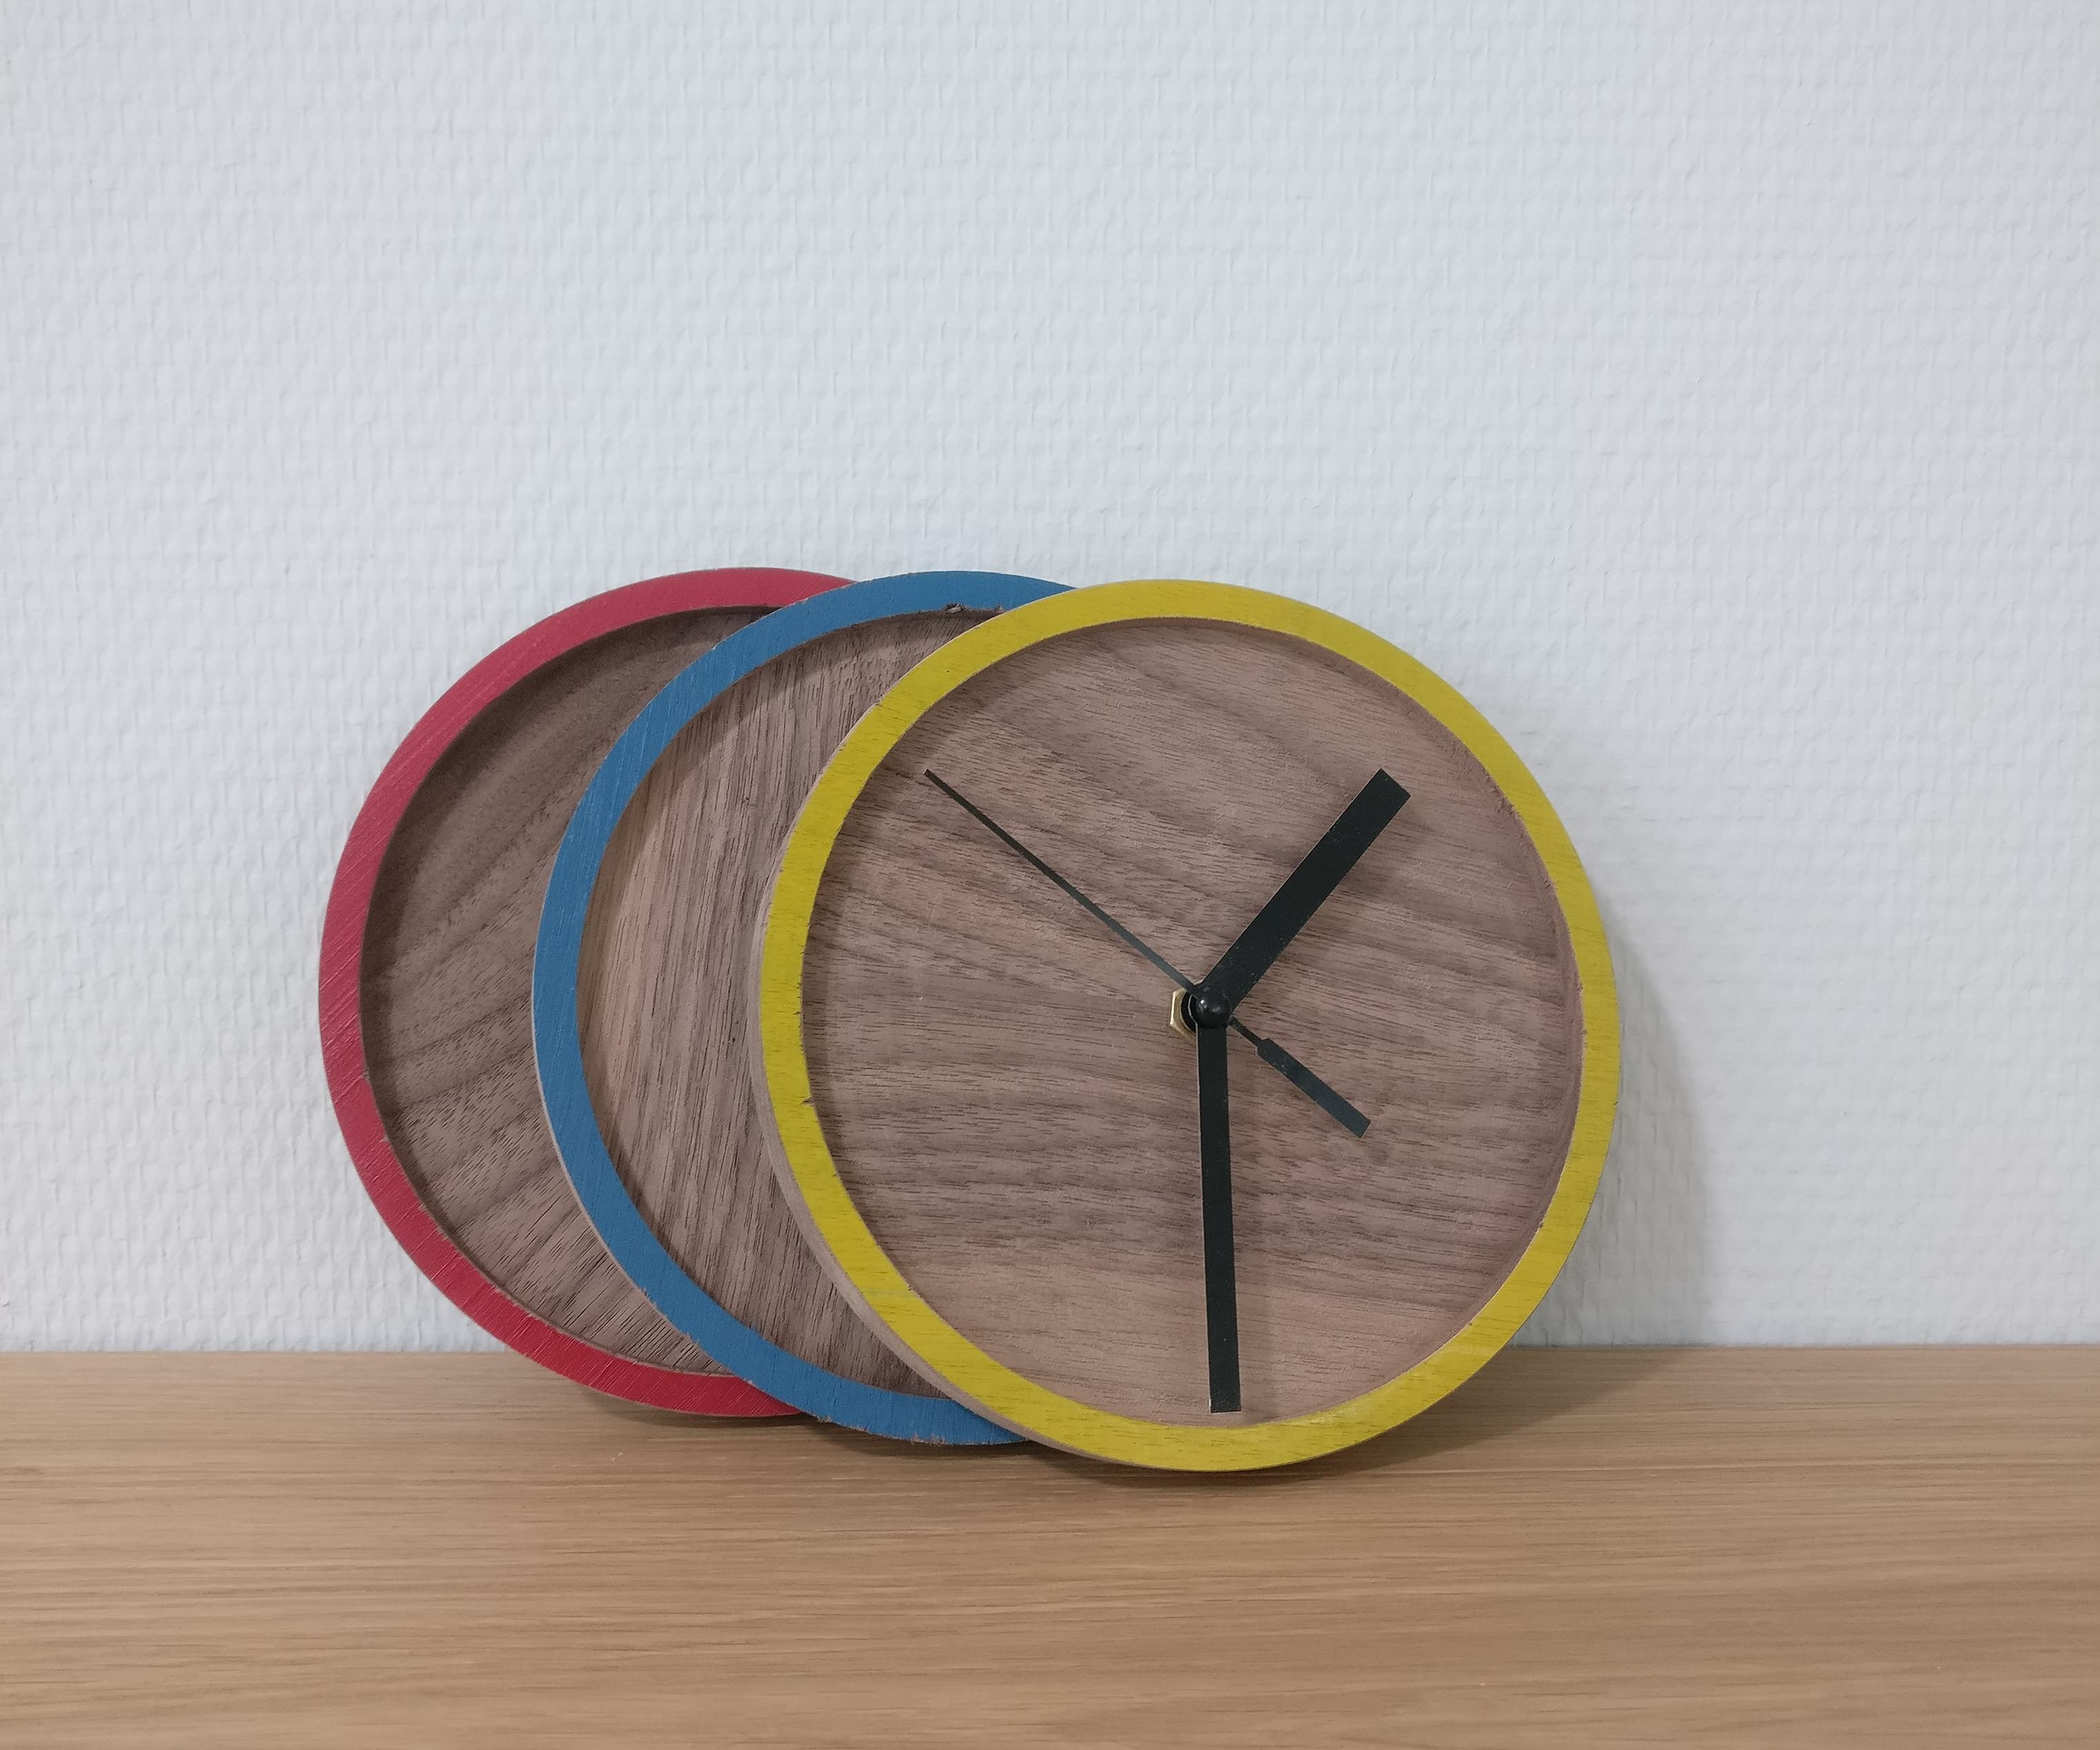 Colorful Mini Clock With CNC